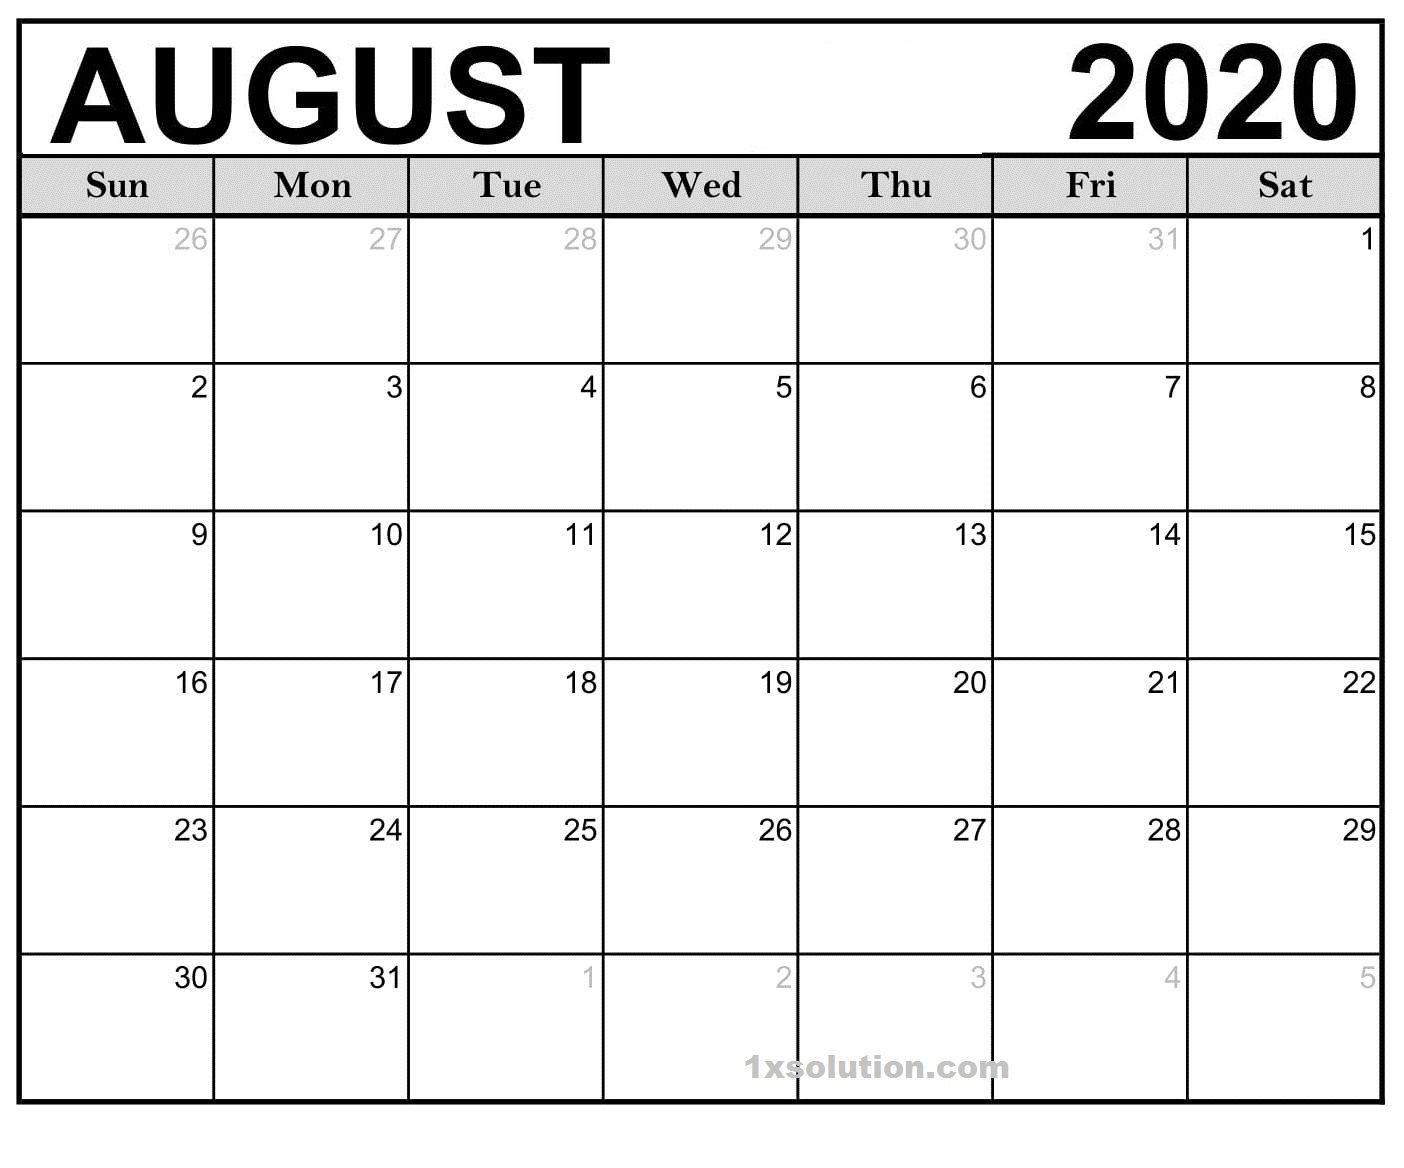 August 2020 PDF Calendar